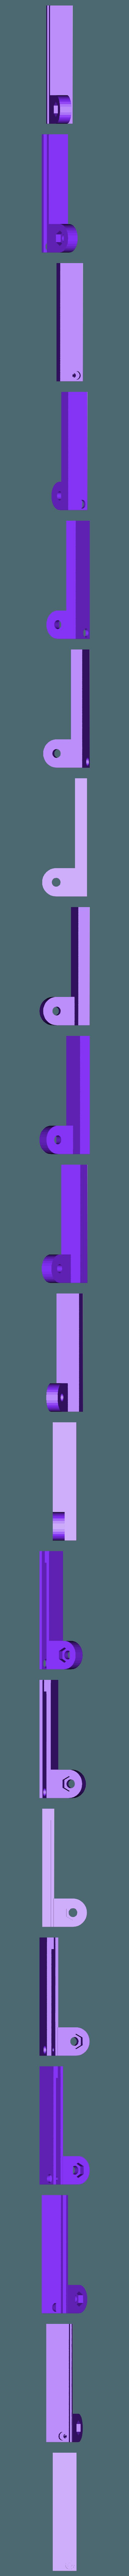 RigthBottom.stl Download free STL file Arduino Uno Slider w/ 2x16 LCD • Design to 3D print, NHiggs